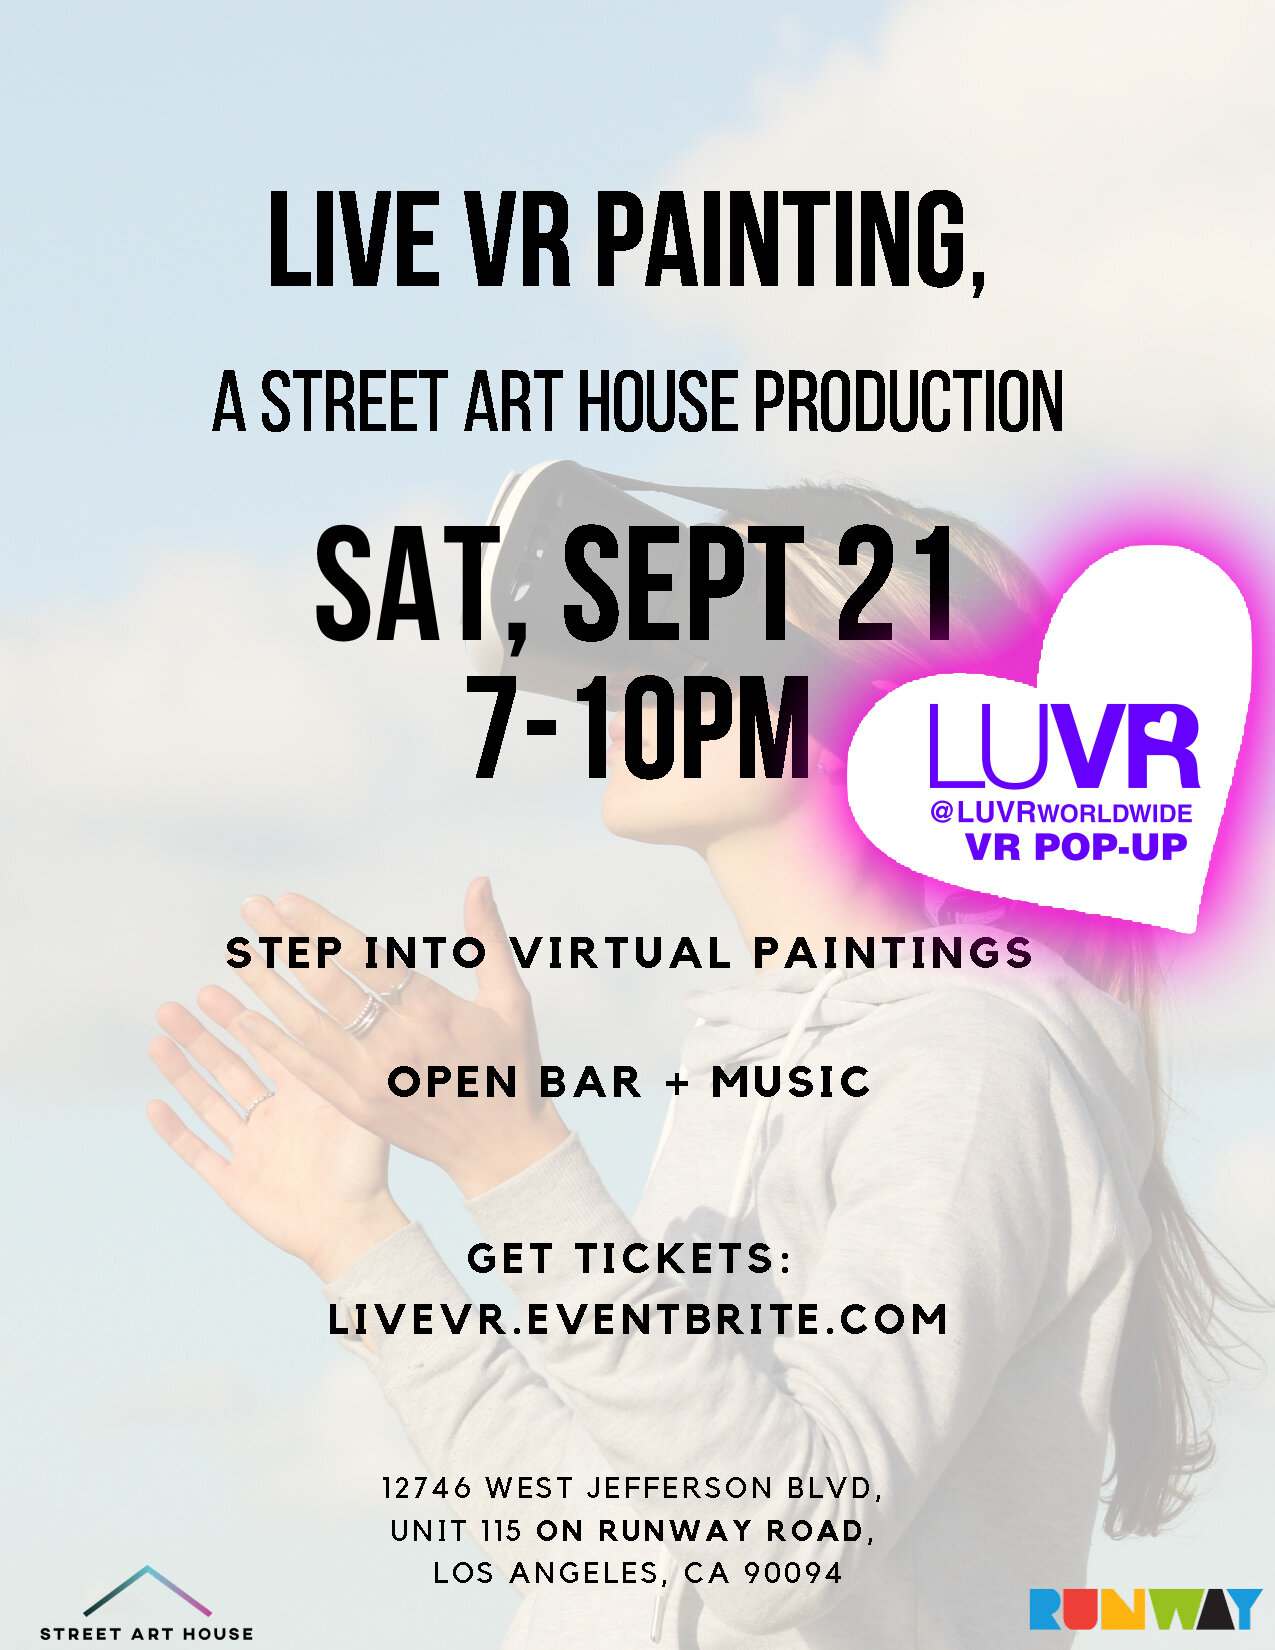 LUVR-Live VR Painting Invite-streetarthouse-LA.jpg